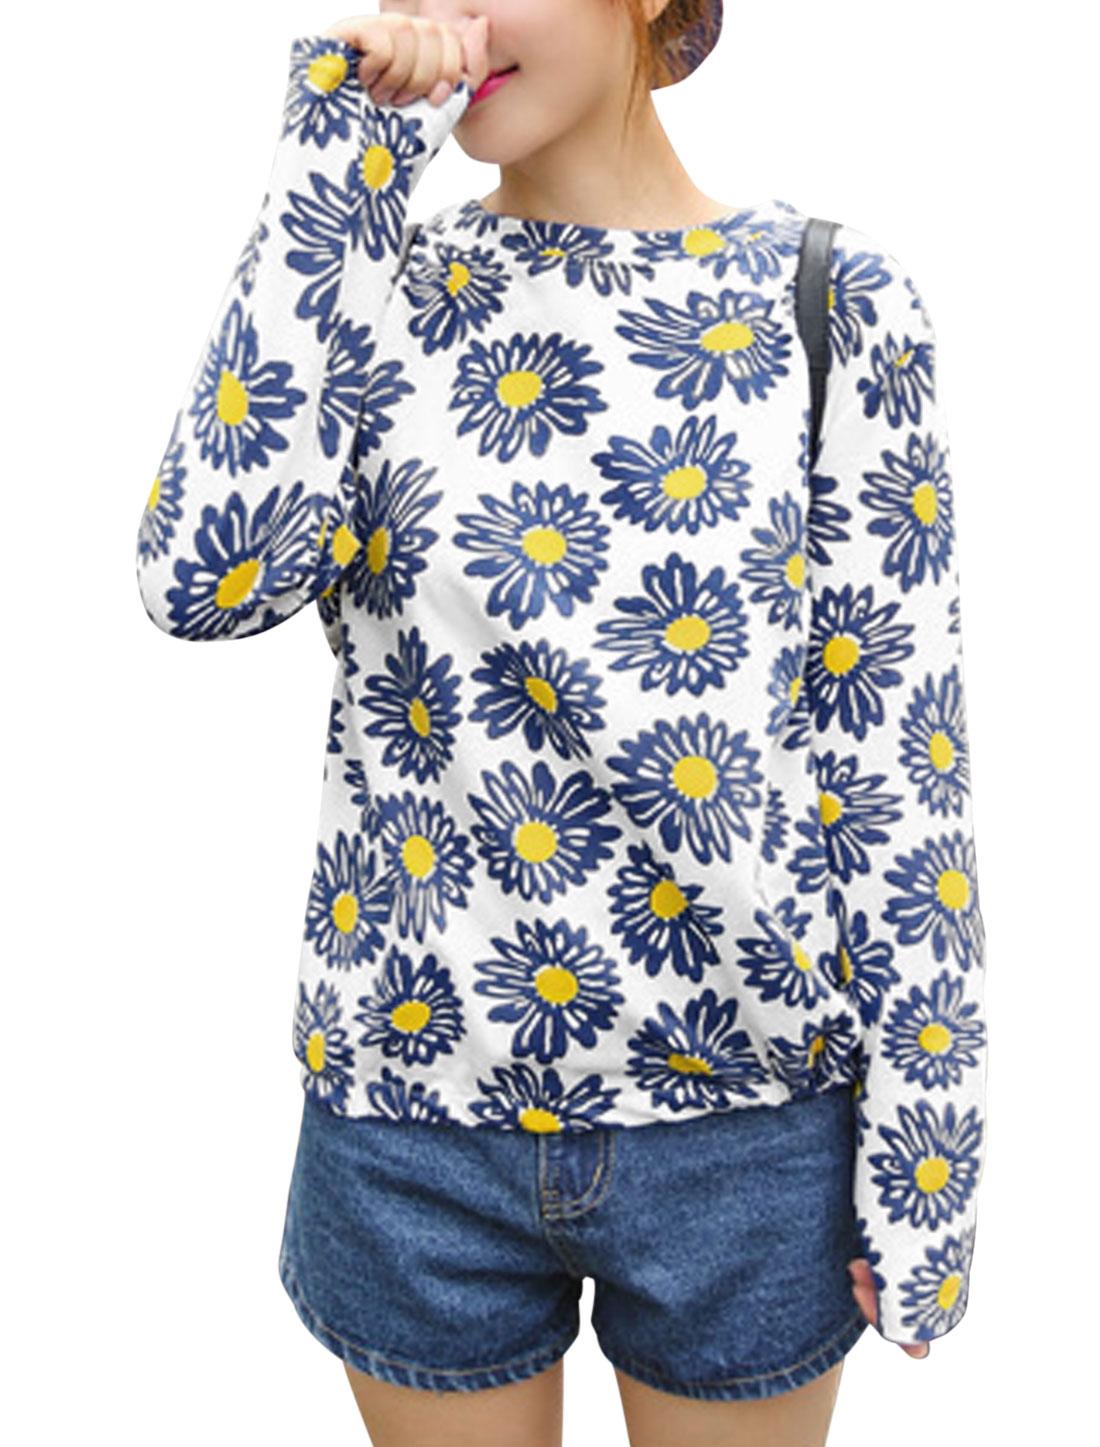 Ladies White Pullover Floral Prints Elastic Trim Loose Leisure Top M